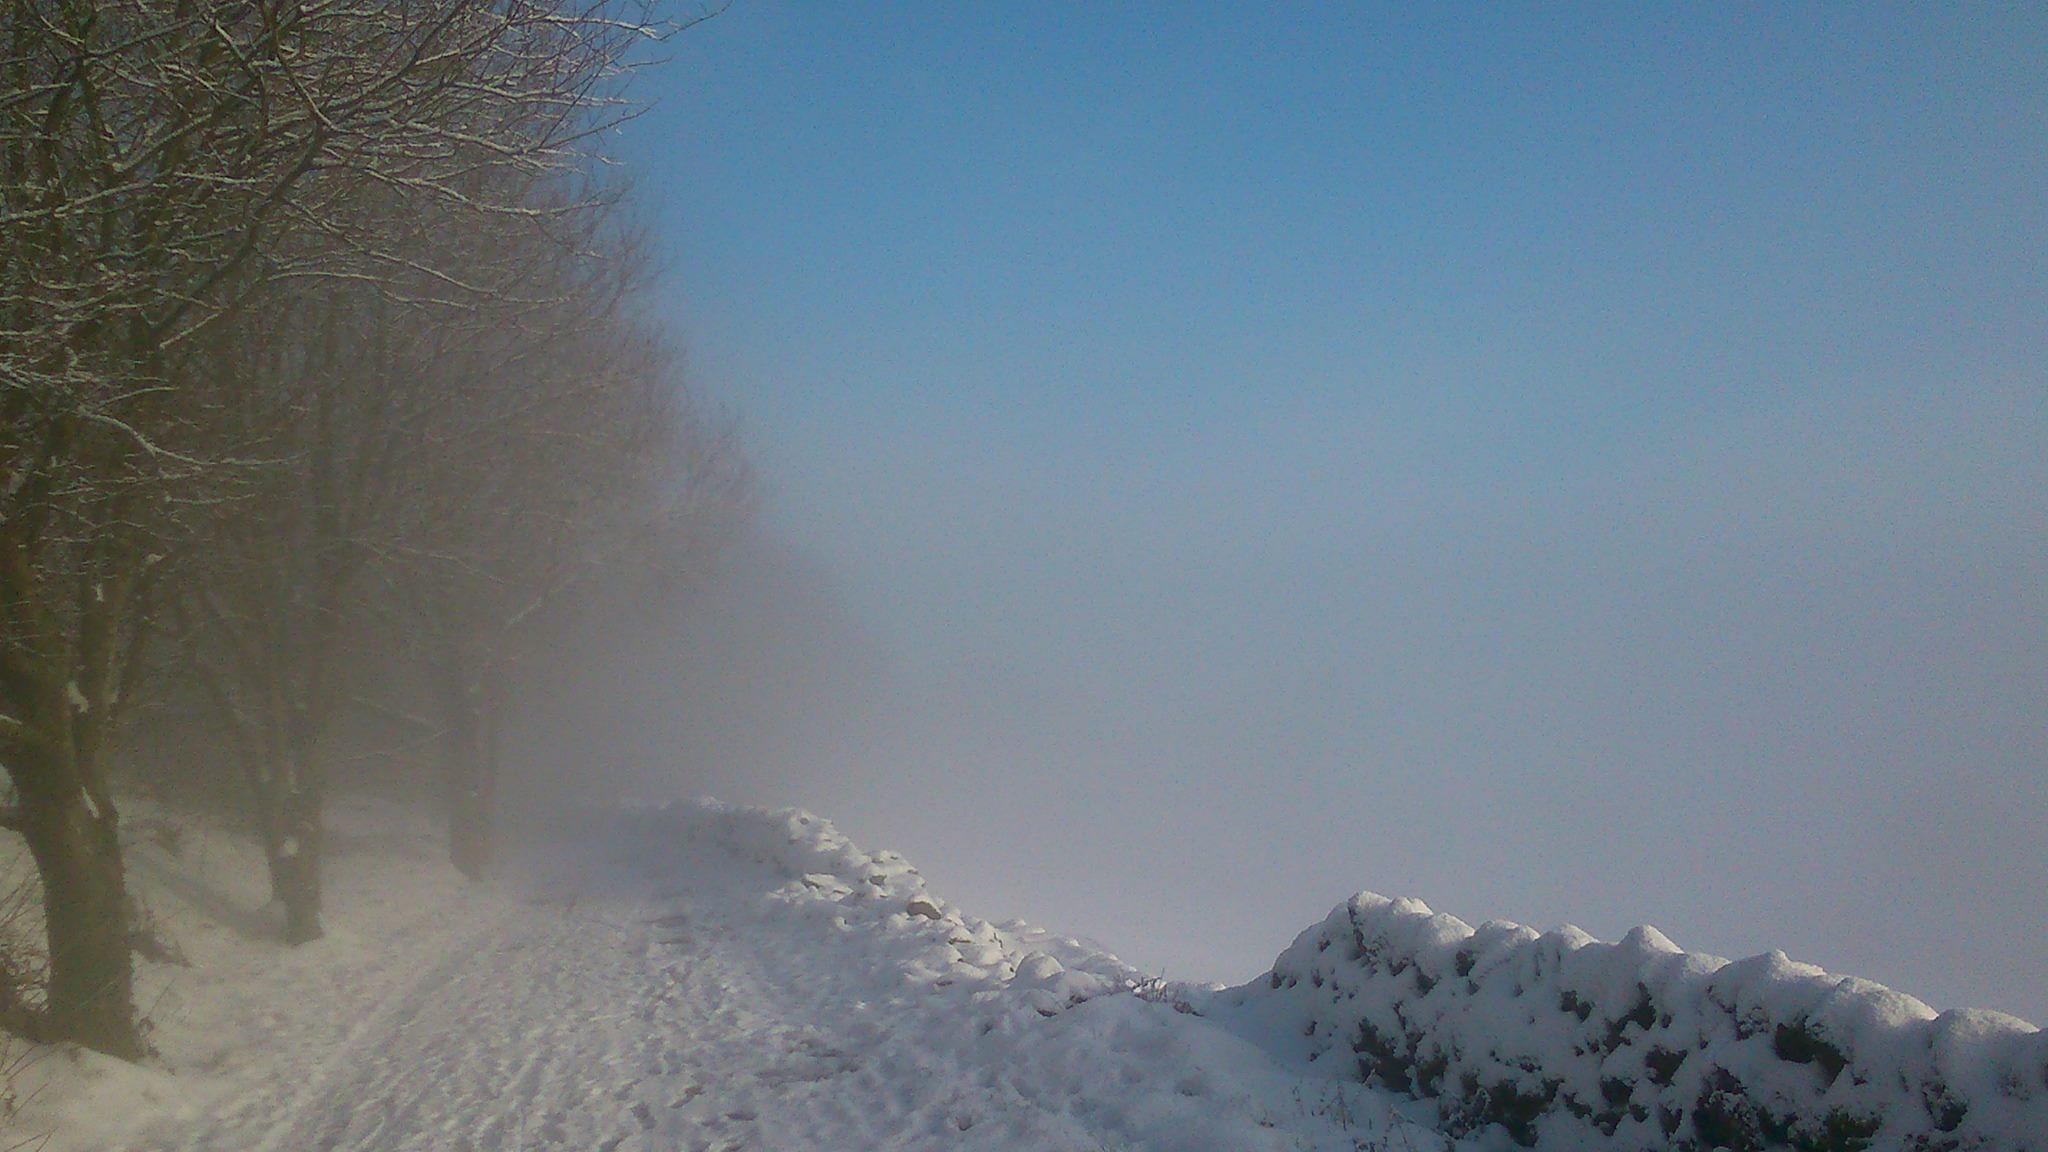 Just above the mist by mandiehart